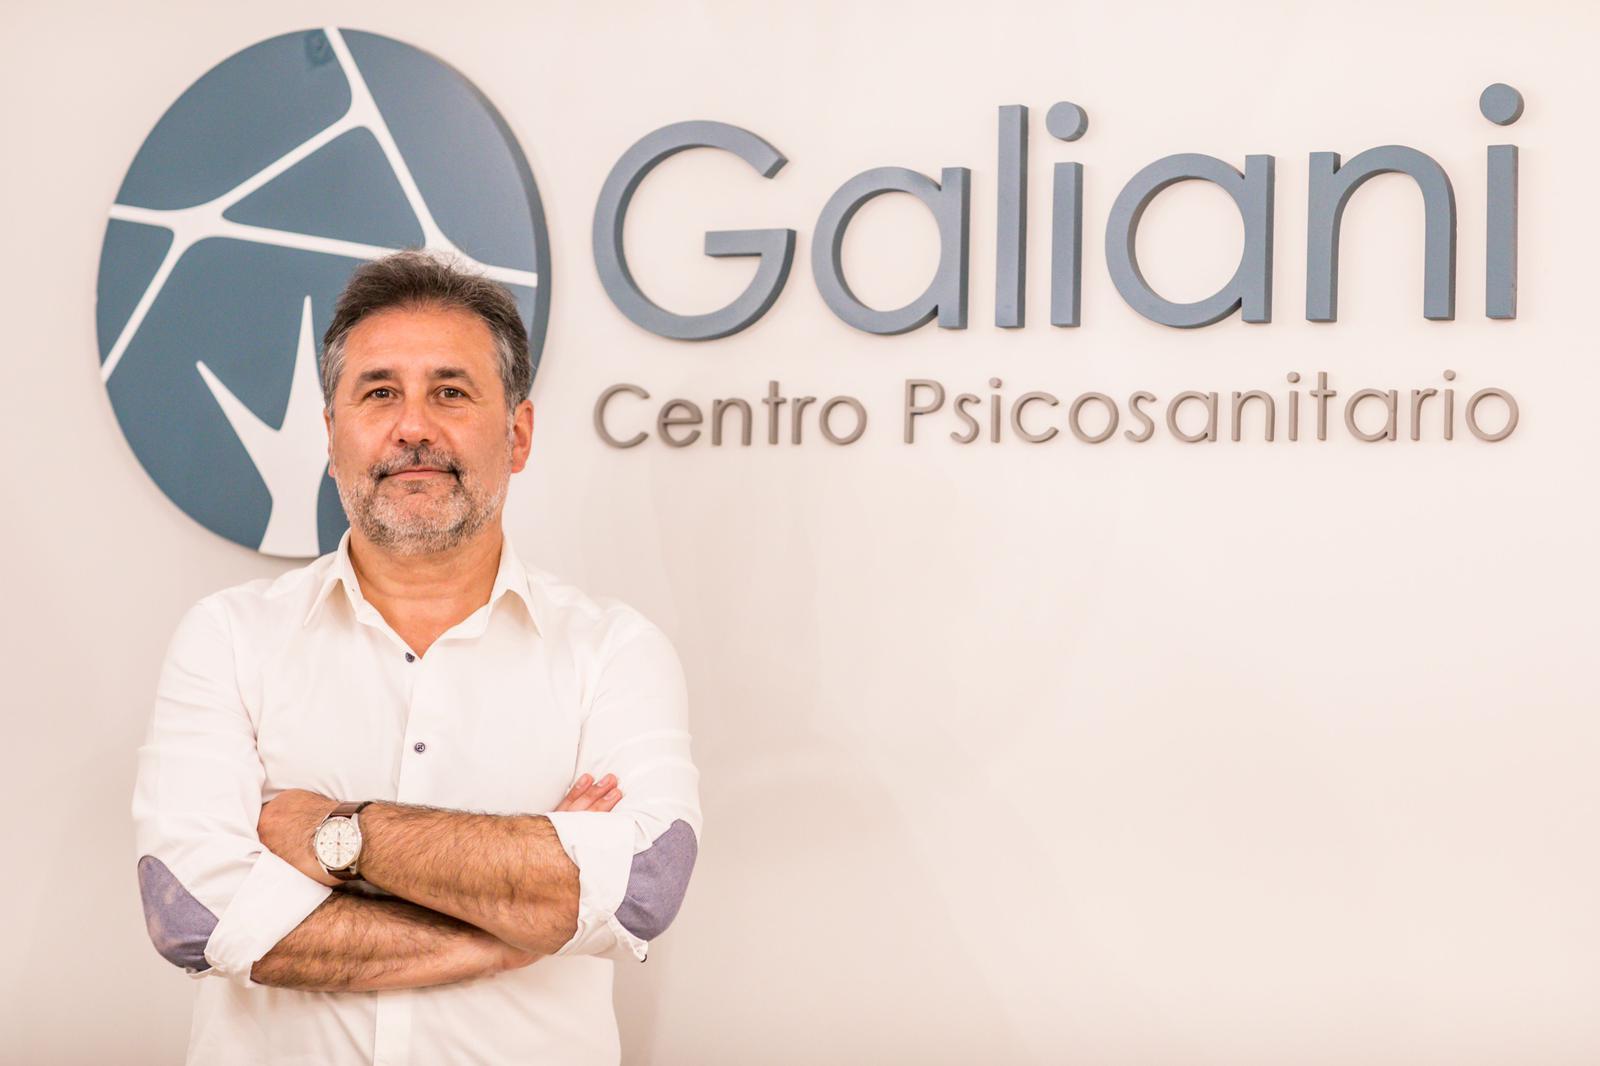 Centro Psicosanitario Galiani en TVE